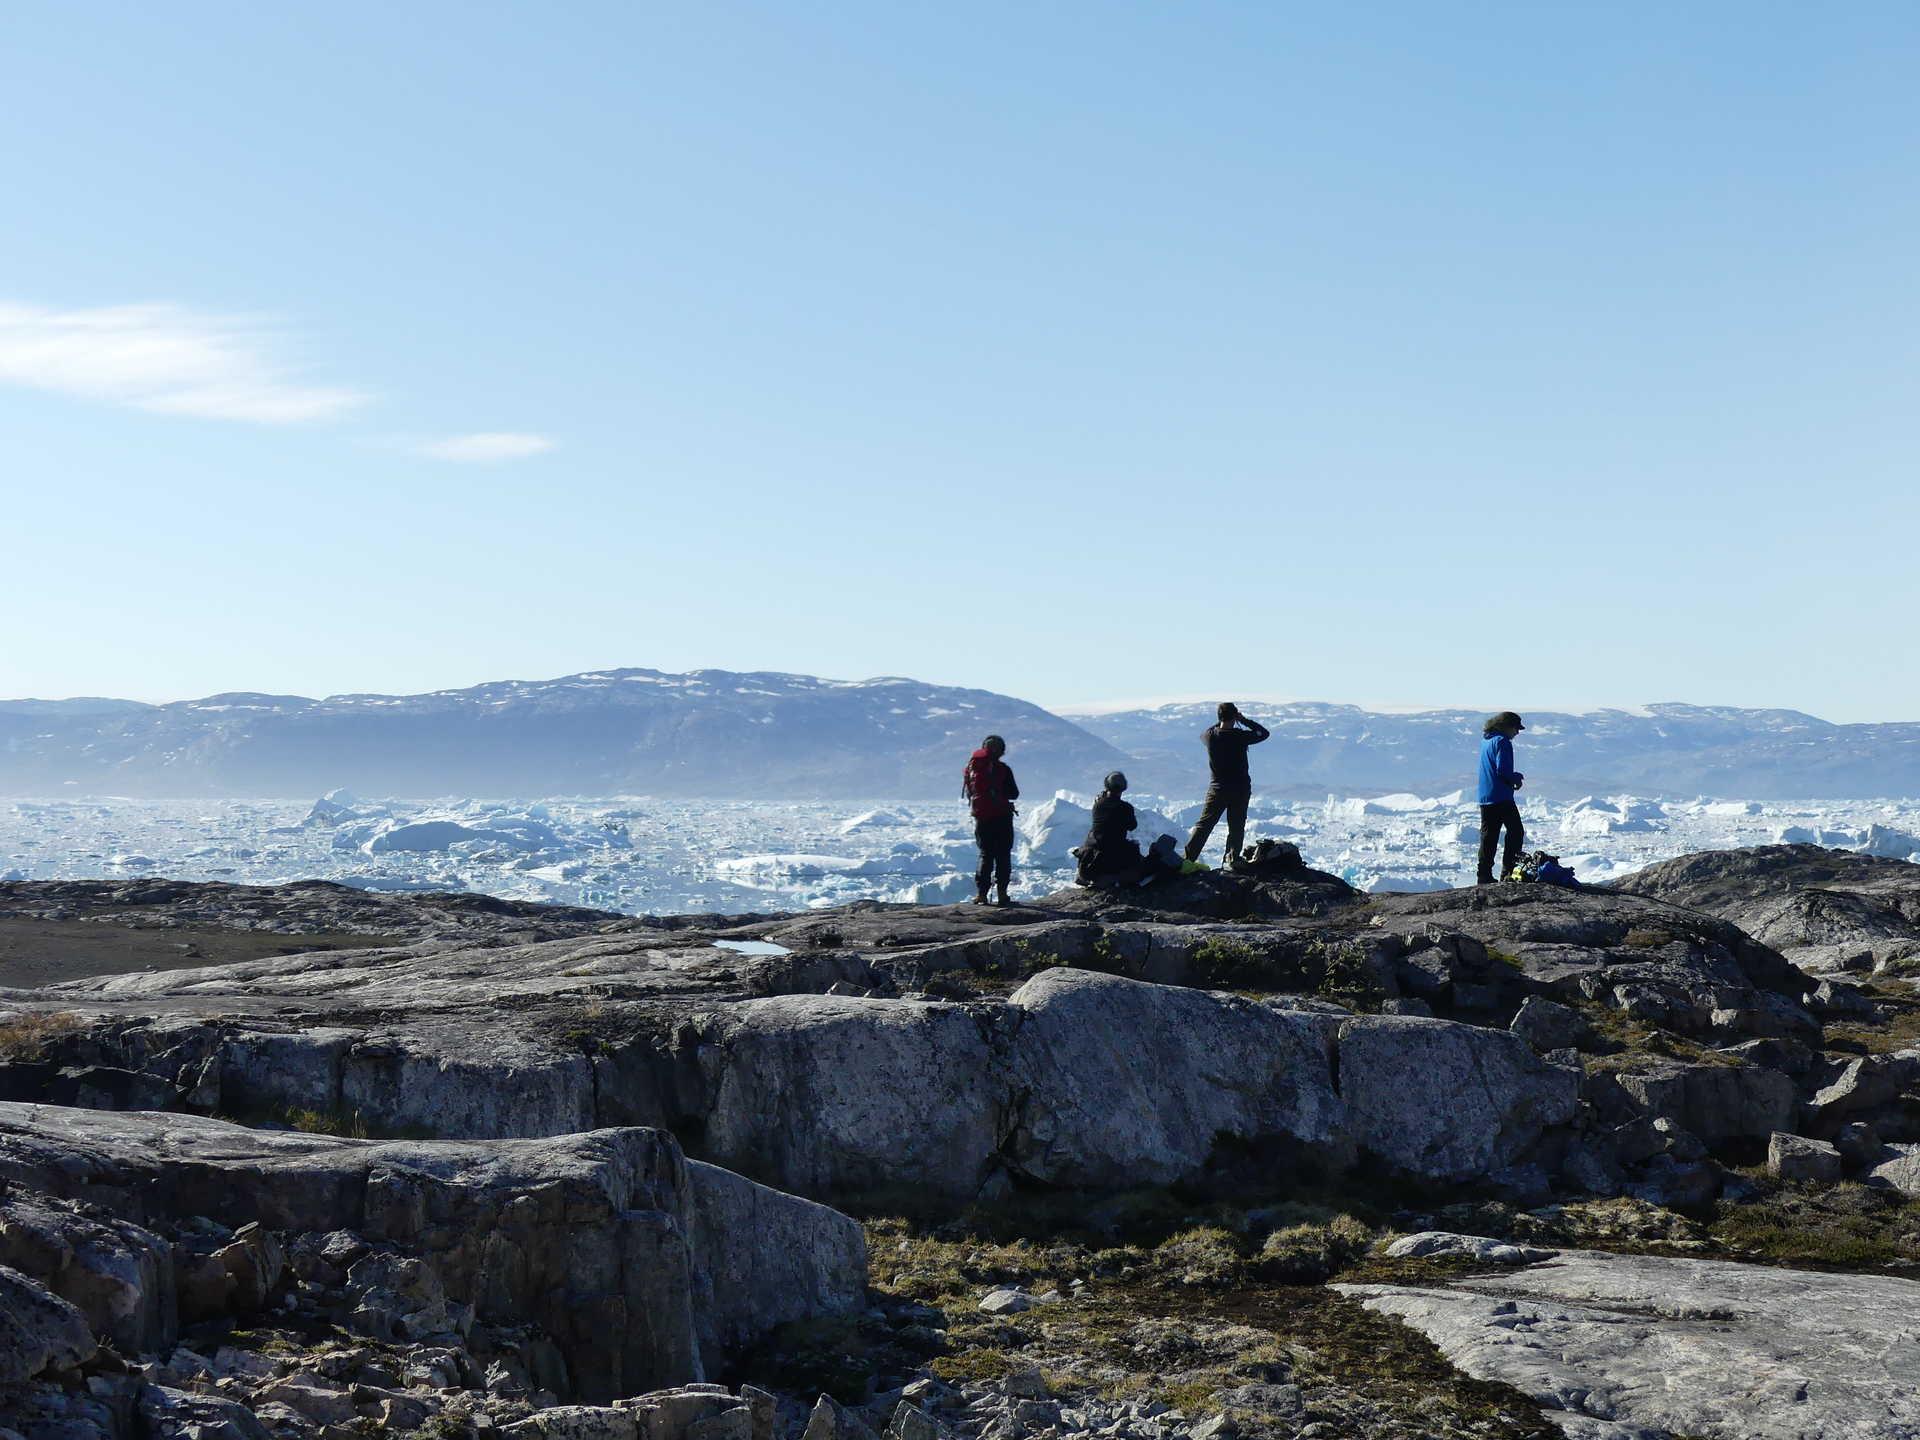 Landscapes of Greenland during Summer